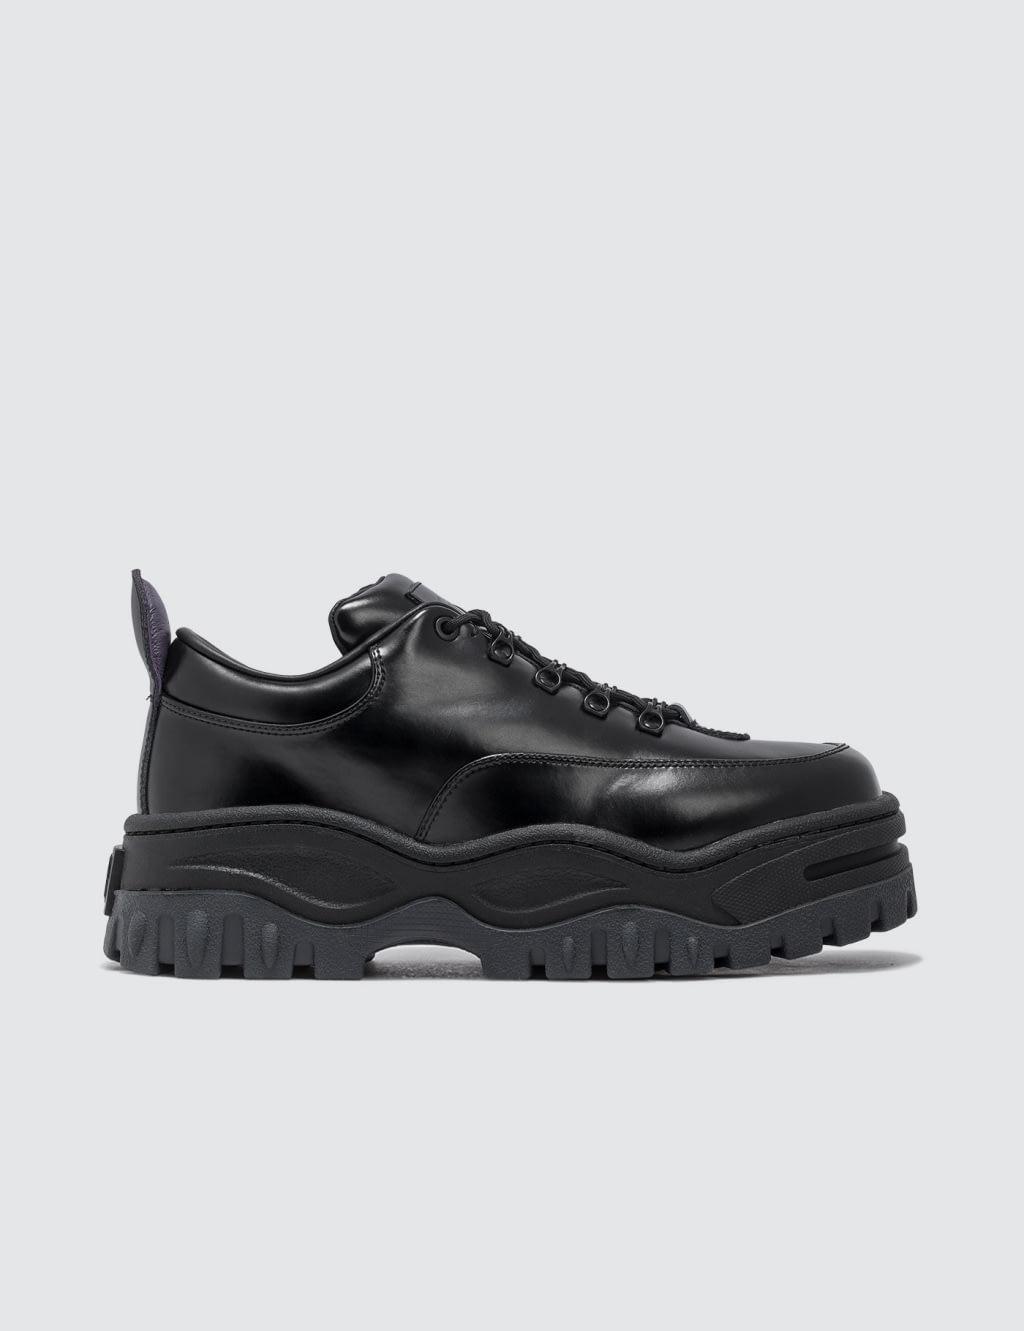 Angel Leather Sneakers Eytys lVgHgV6B5